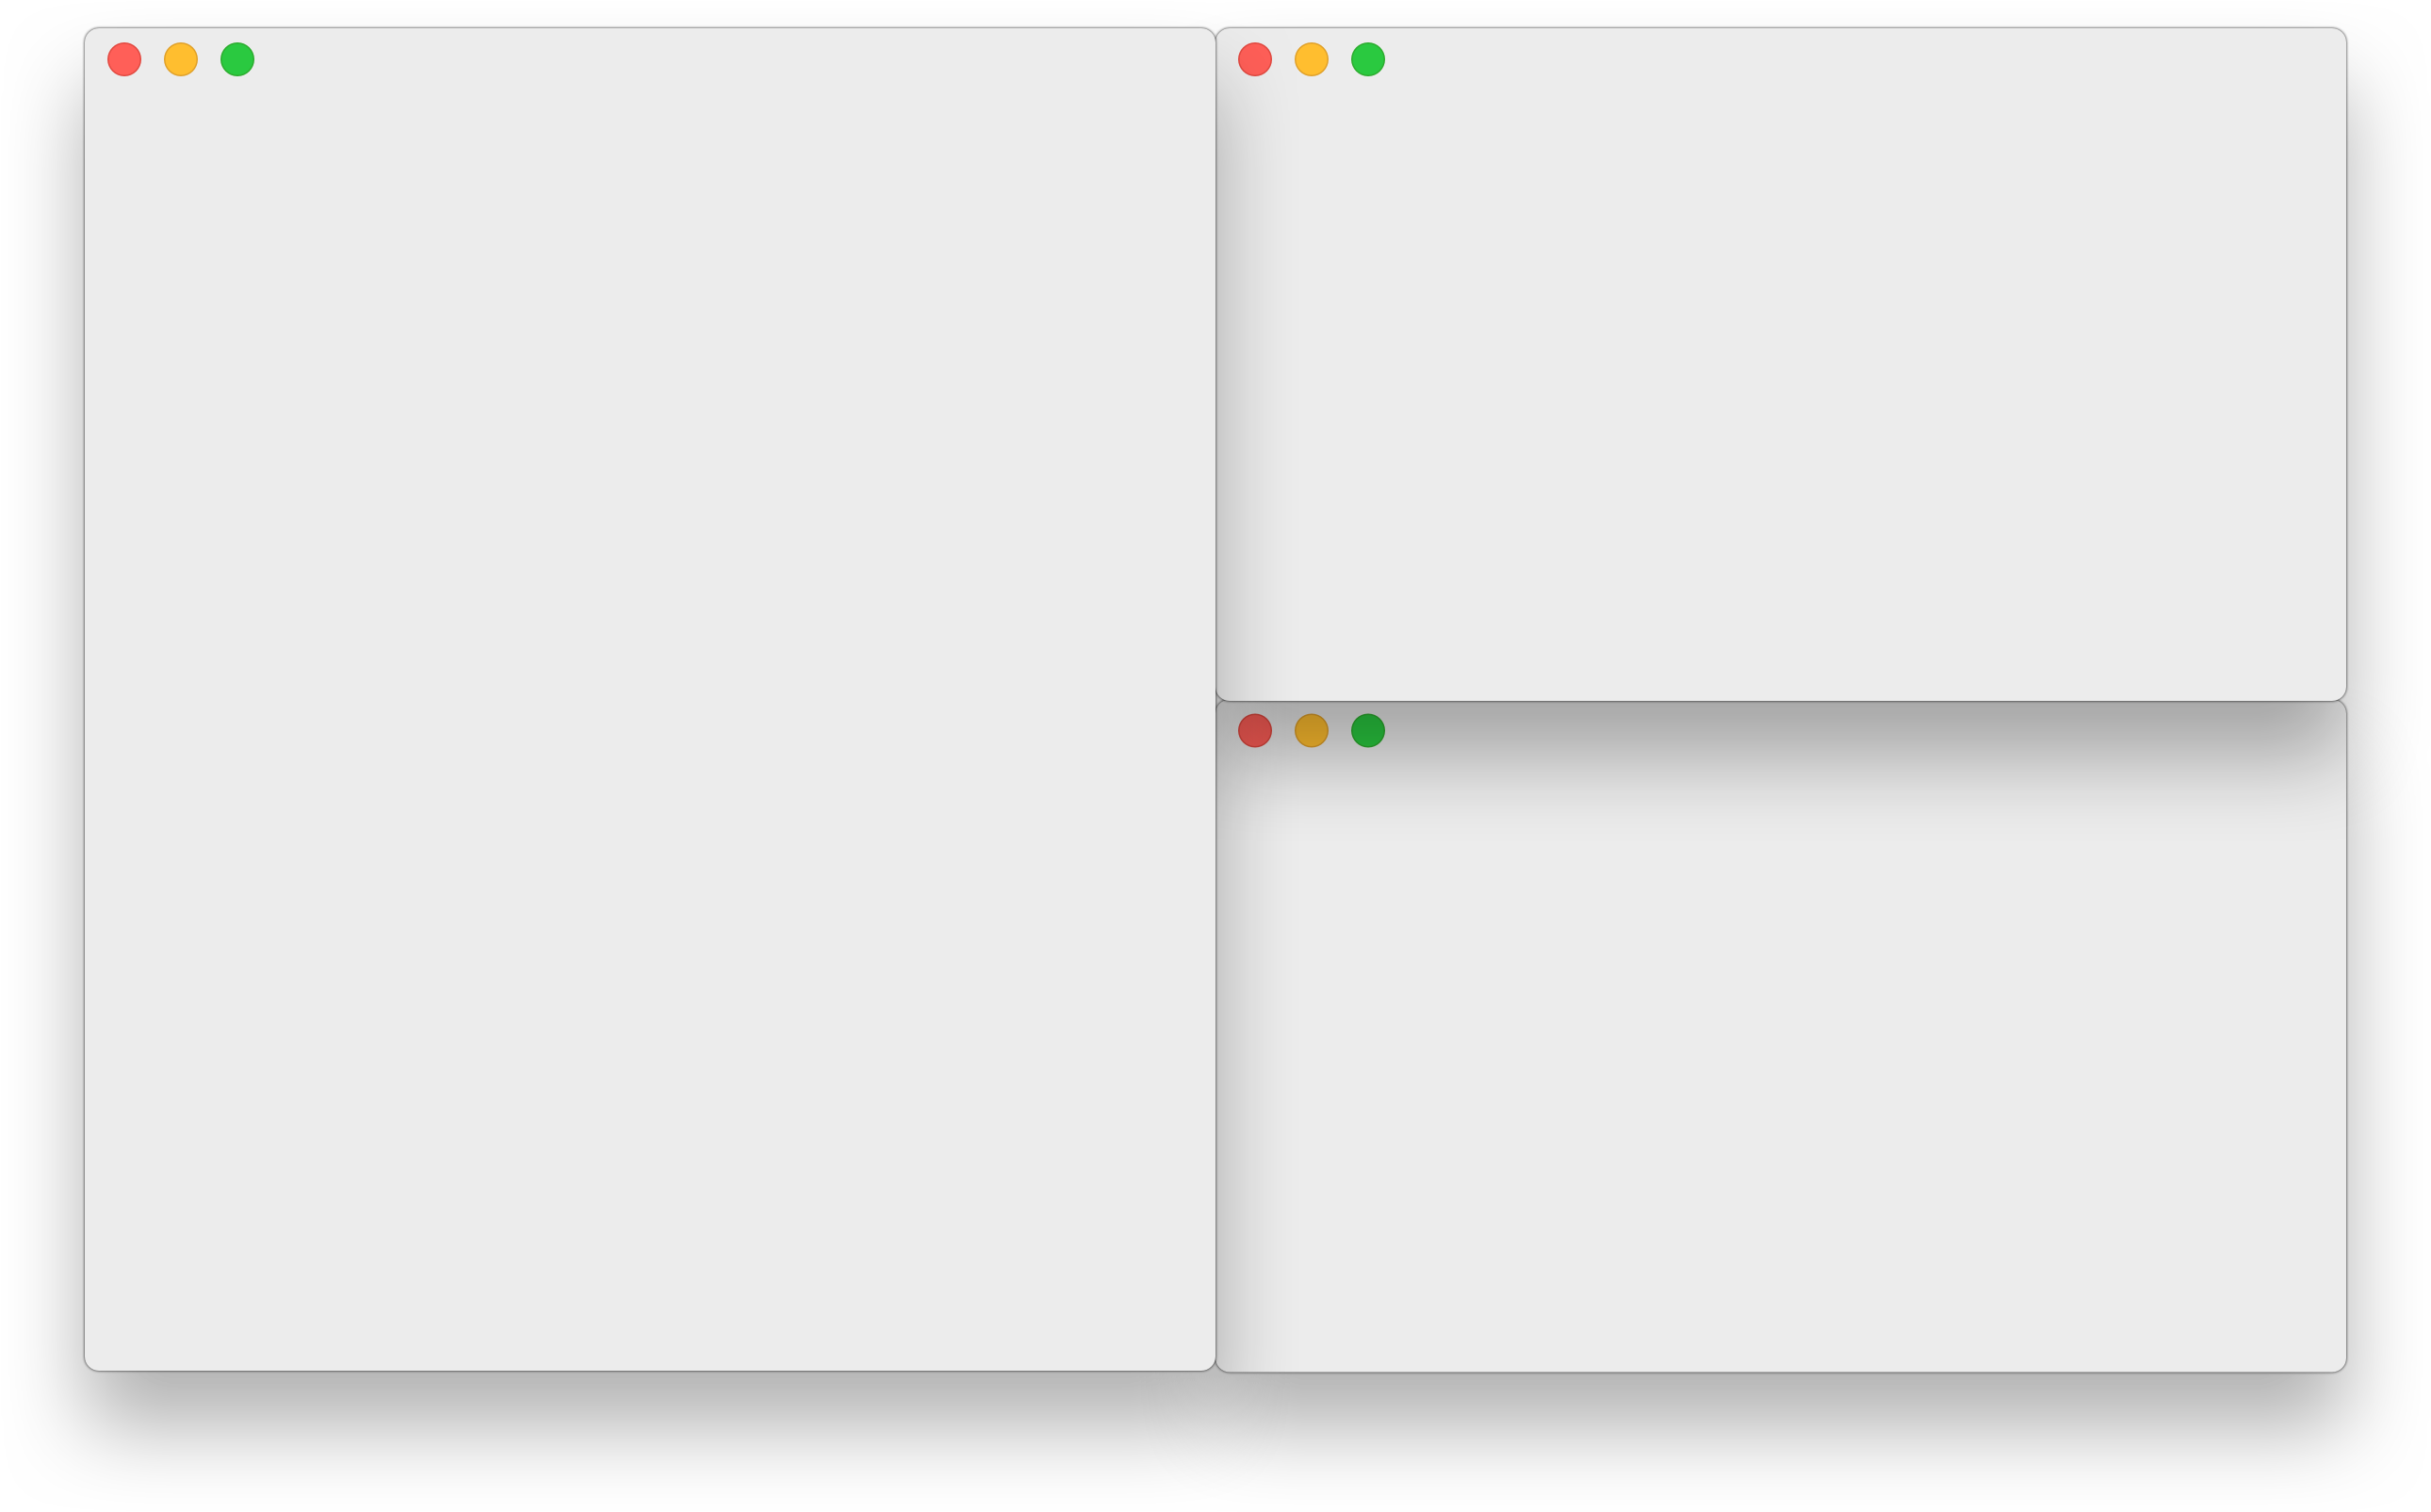 mac os x windows keyboard mapping